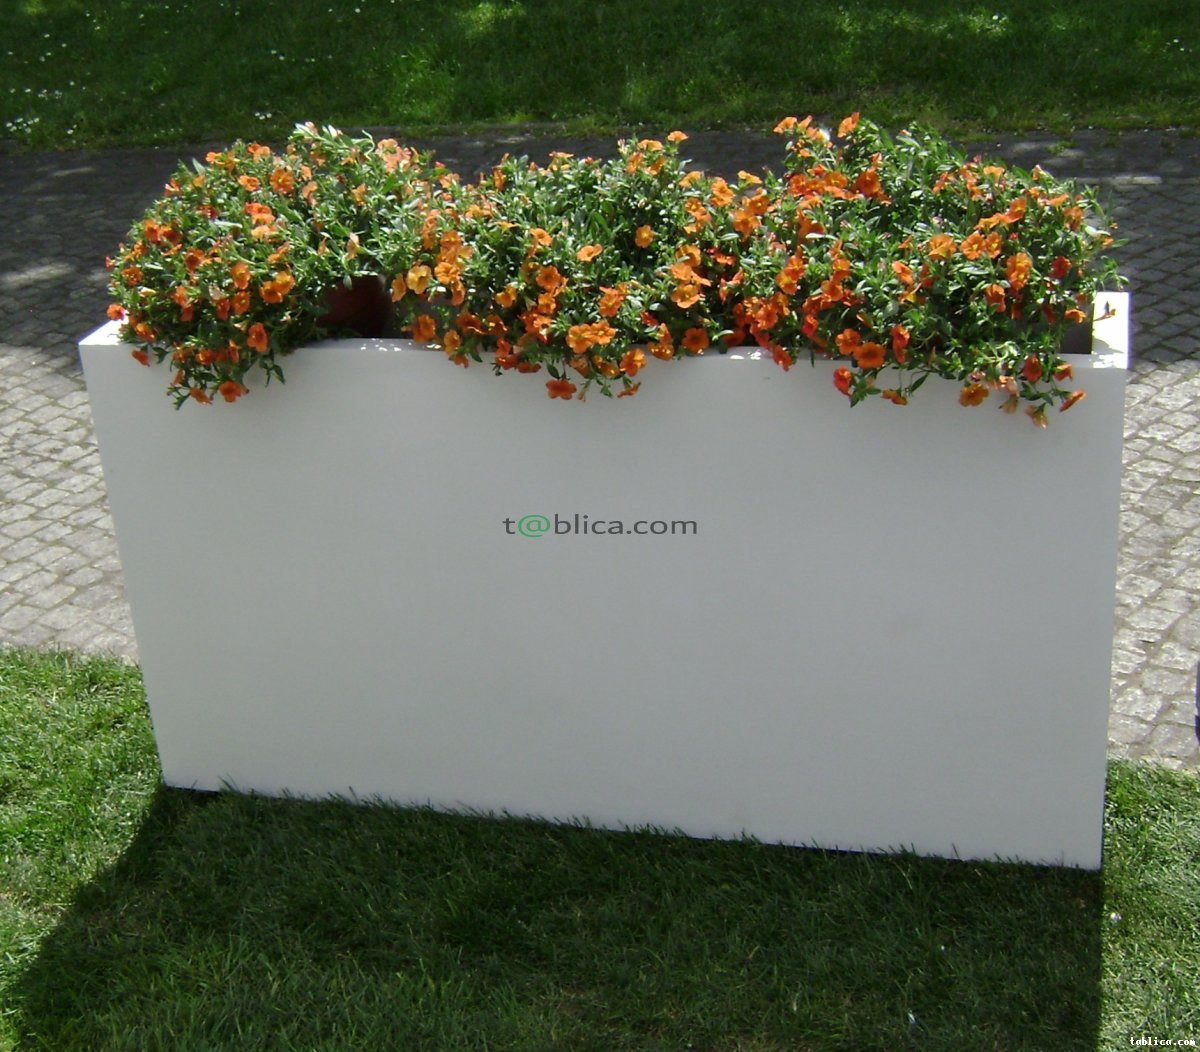 Donice na wymiar na taras do ogrodu do domu